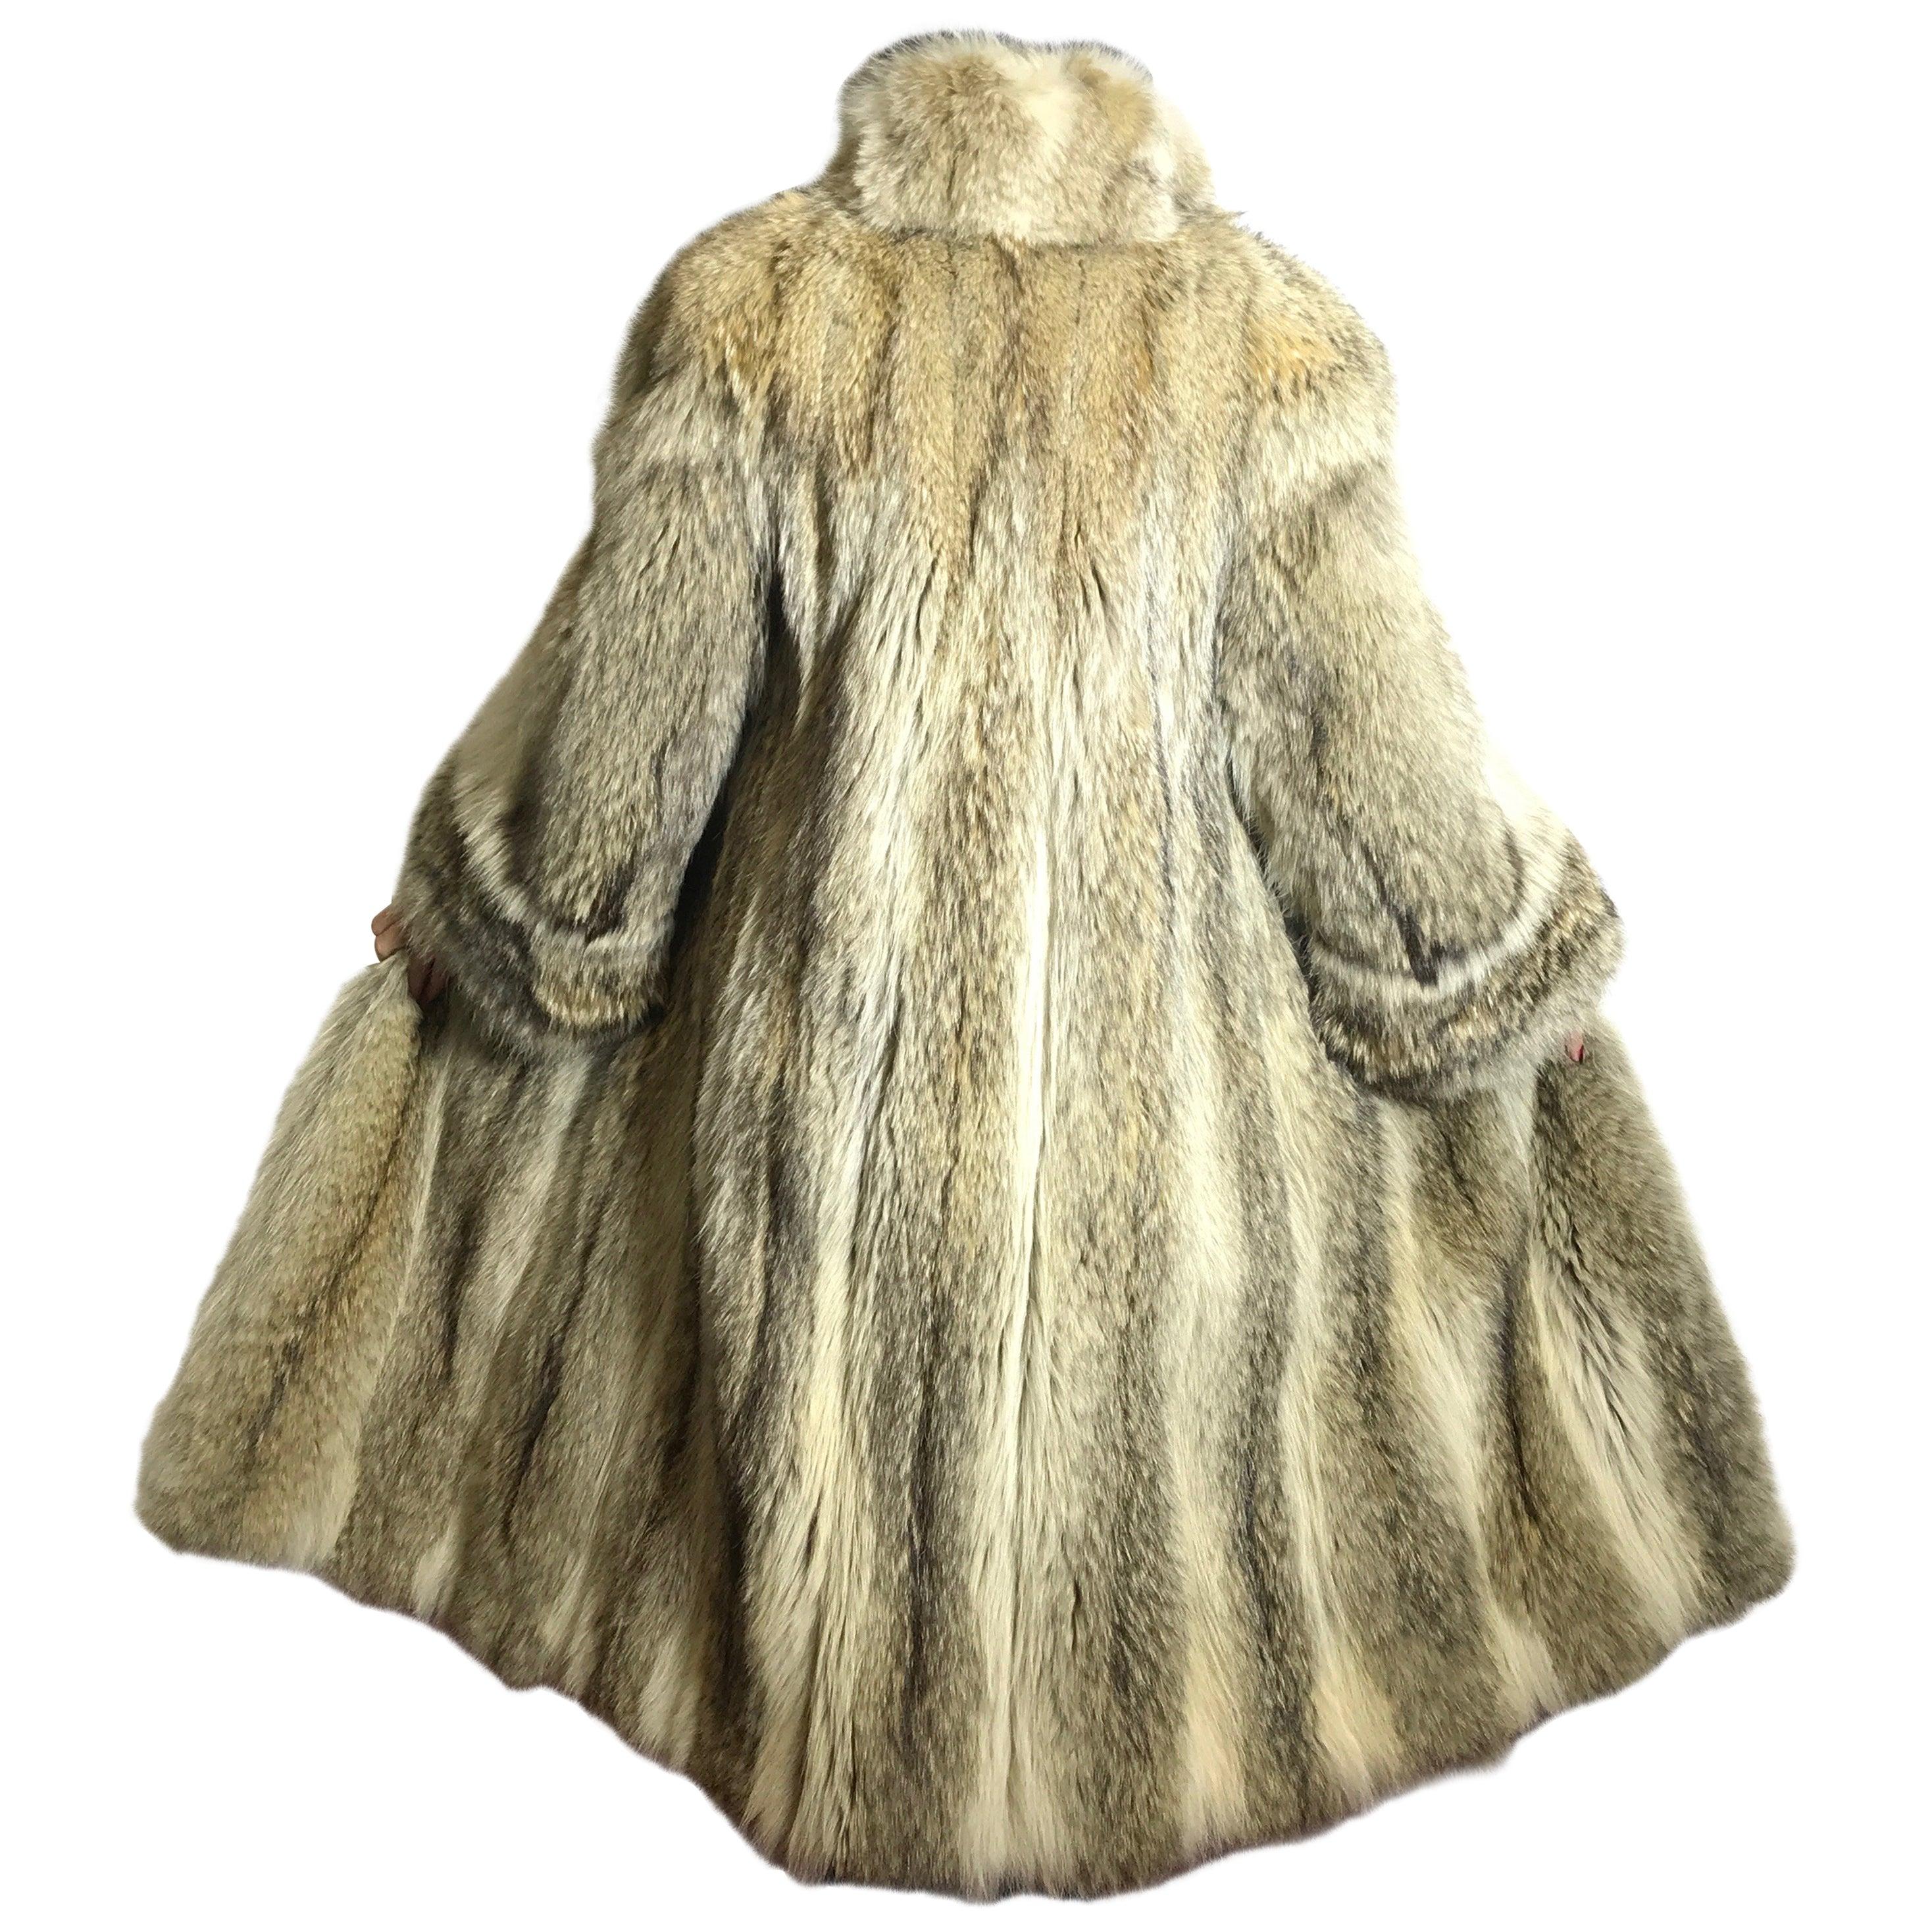 Coyote Fur Coat >> Long Coyote Fur Coat Shadow Fox Tan White 15 For Sale At 1stdibs